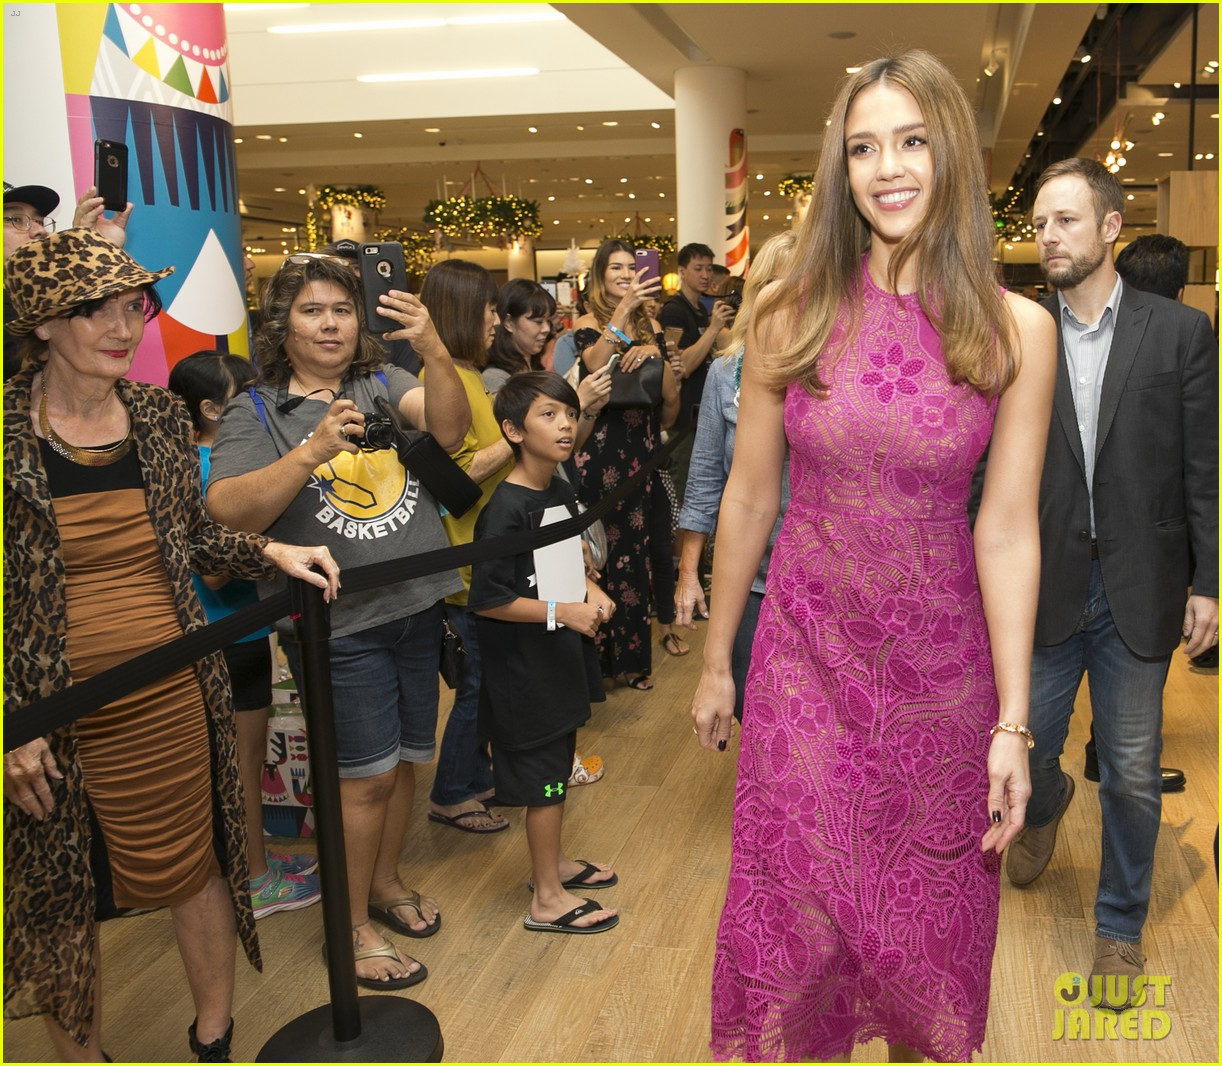 Full Sized Photo Of Jessica Alba Honest Company Meet Greet Hawaii 03